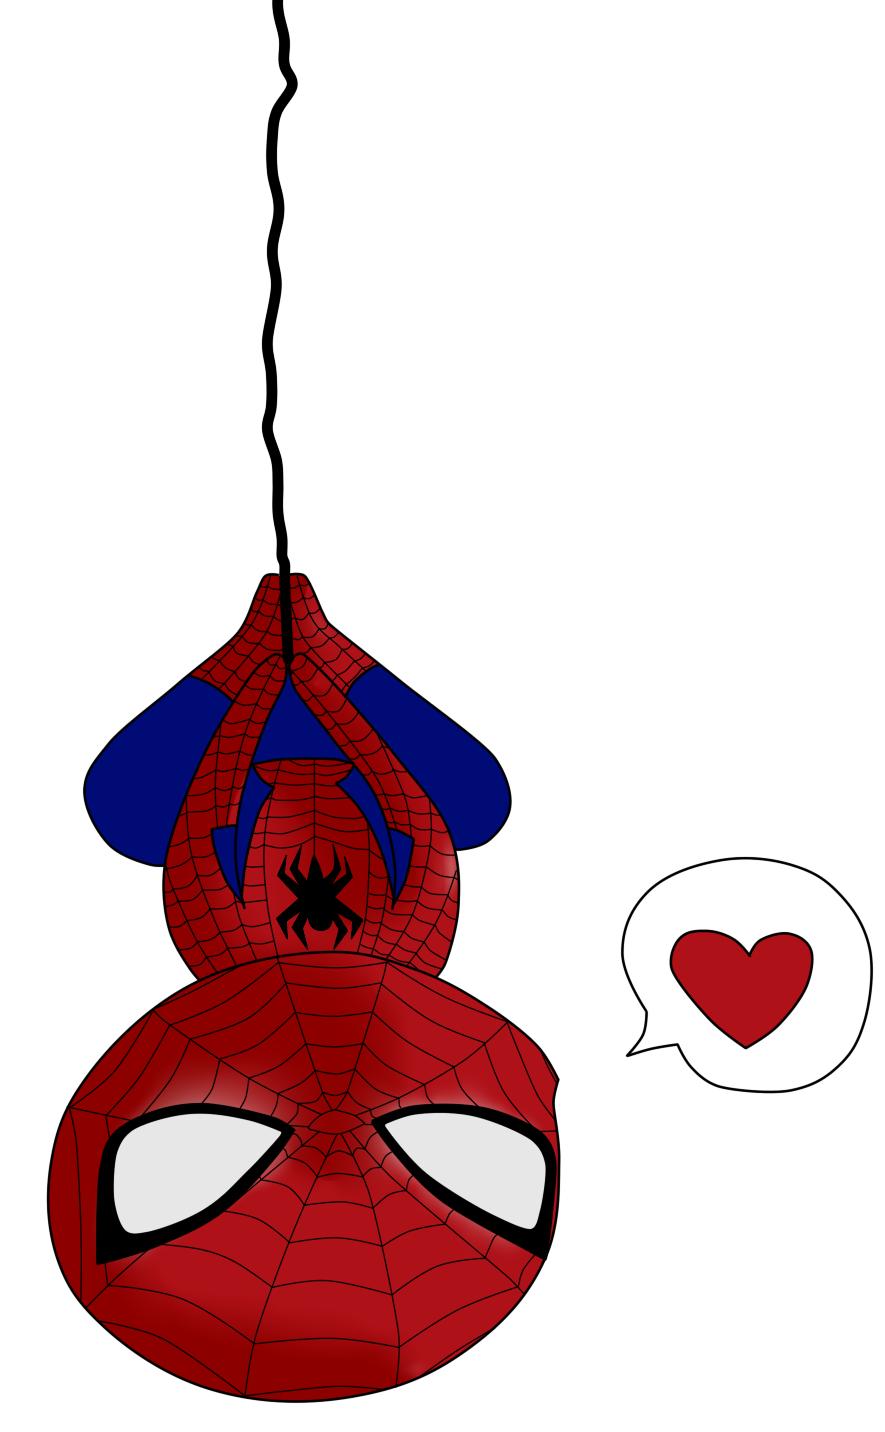 Spiderman cute - photo#1